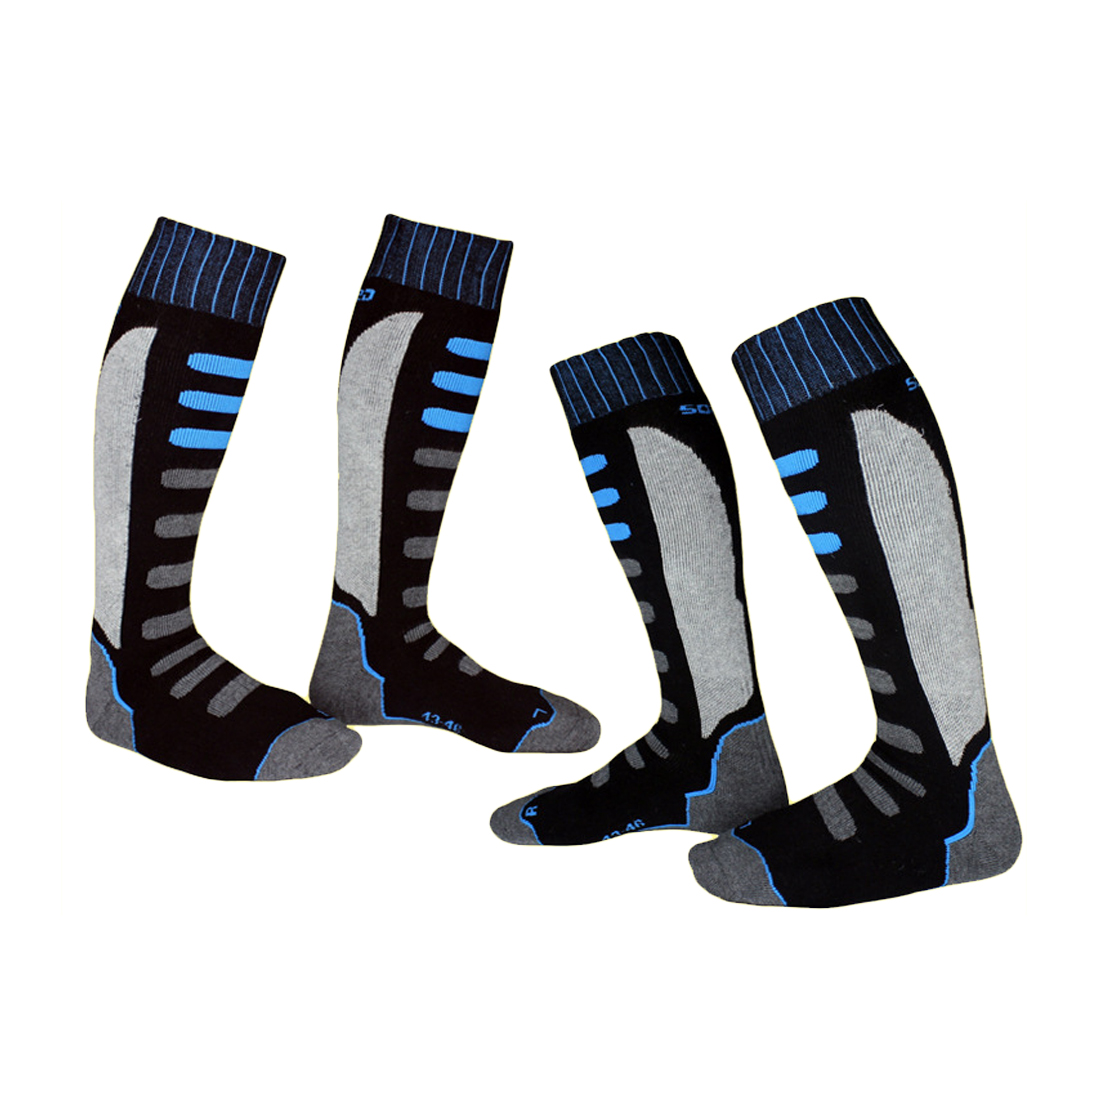 Hot New Winter Warm Men Thermal Ski Socks Thick Cotton Sports Snowboard Cycling Skiing Soccer Socks Thermosocks Leg Warmers Sox